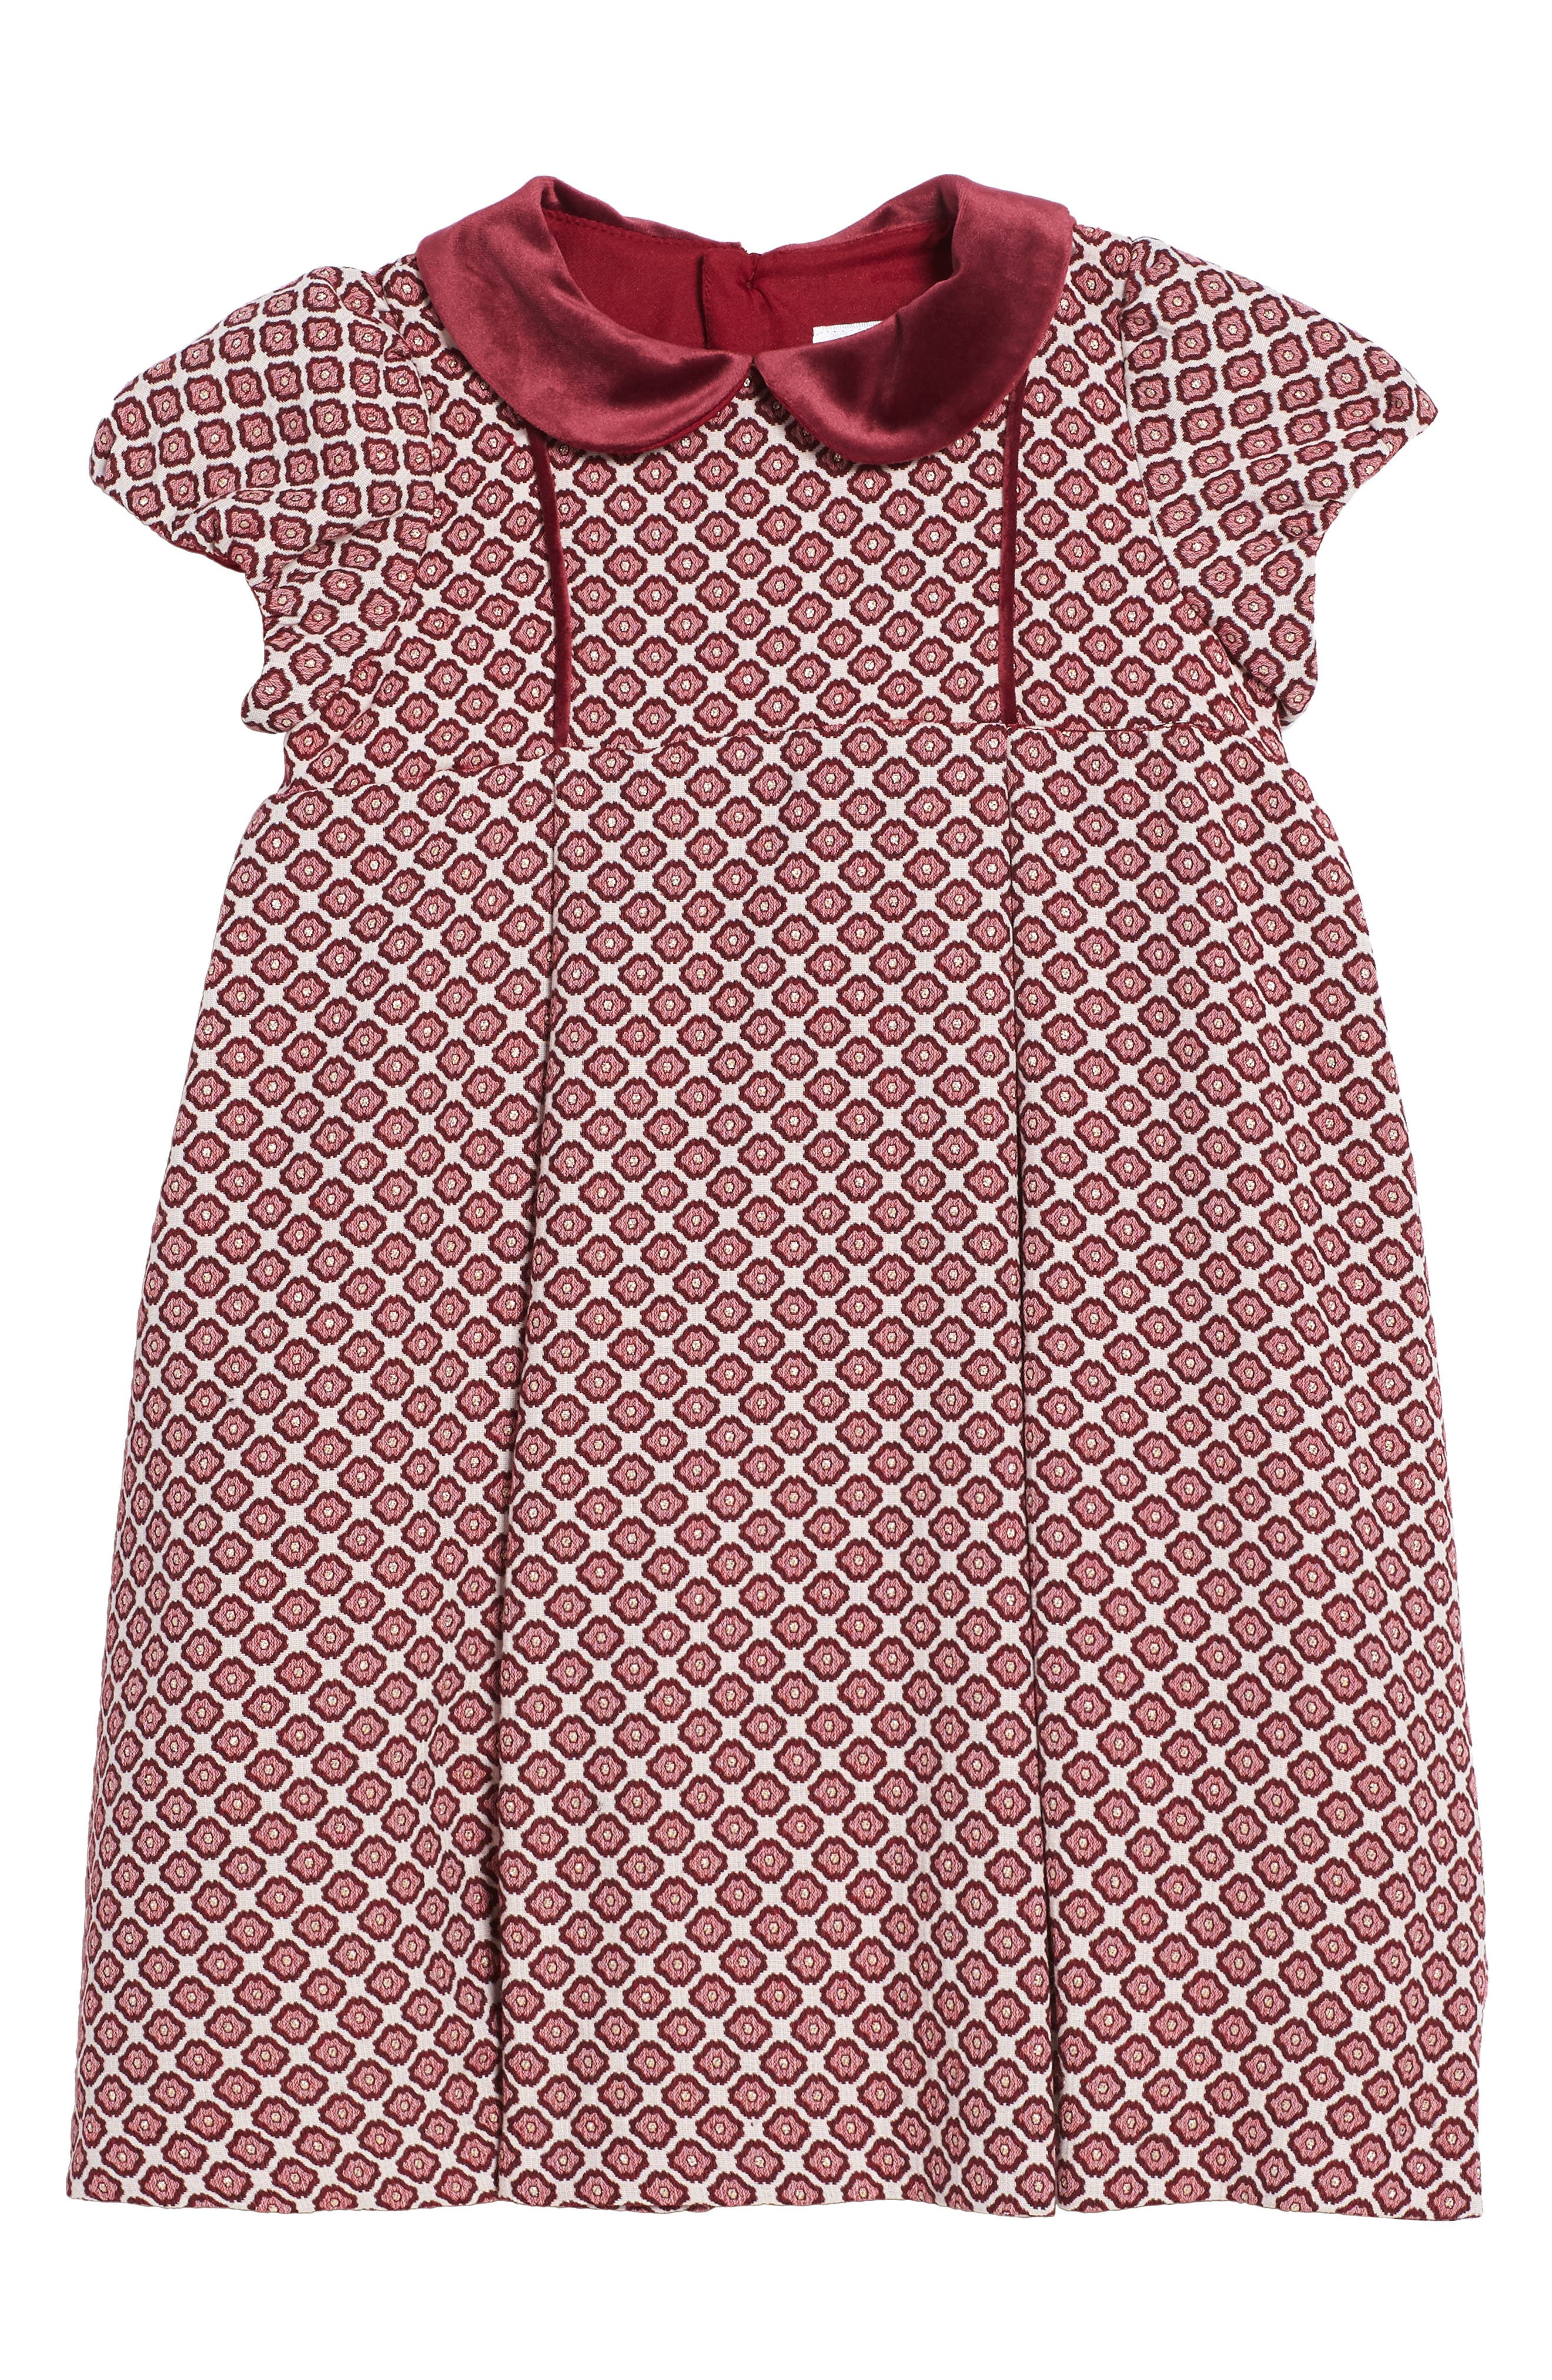 Alternate Image 1 Selected - Luli & Me Floral Jacquard Dress (Toddler Girls)